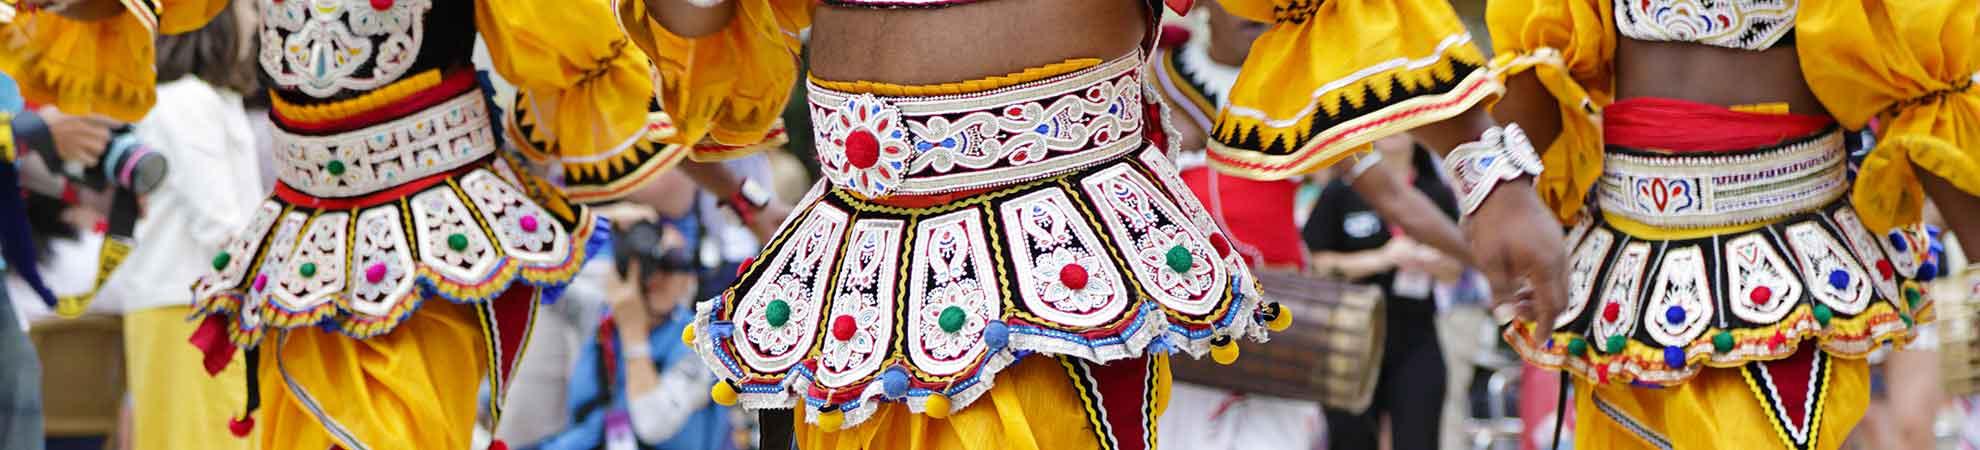 Festivités et jours fériés au Sri Lanka